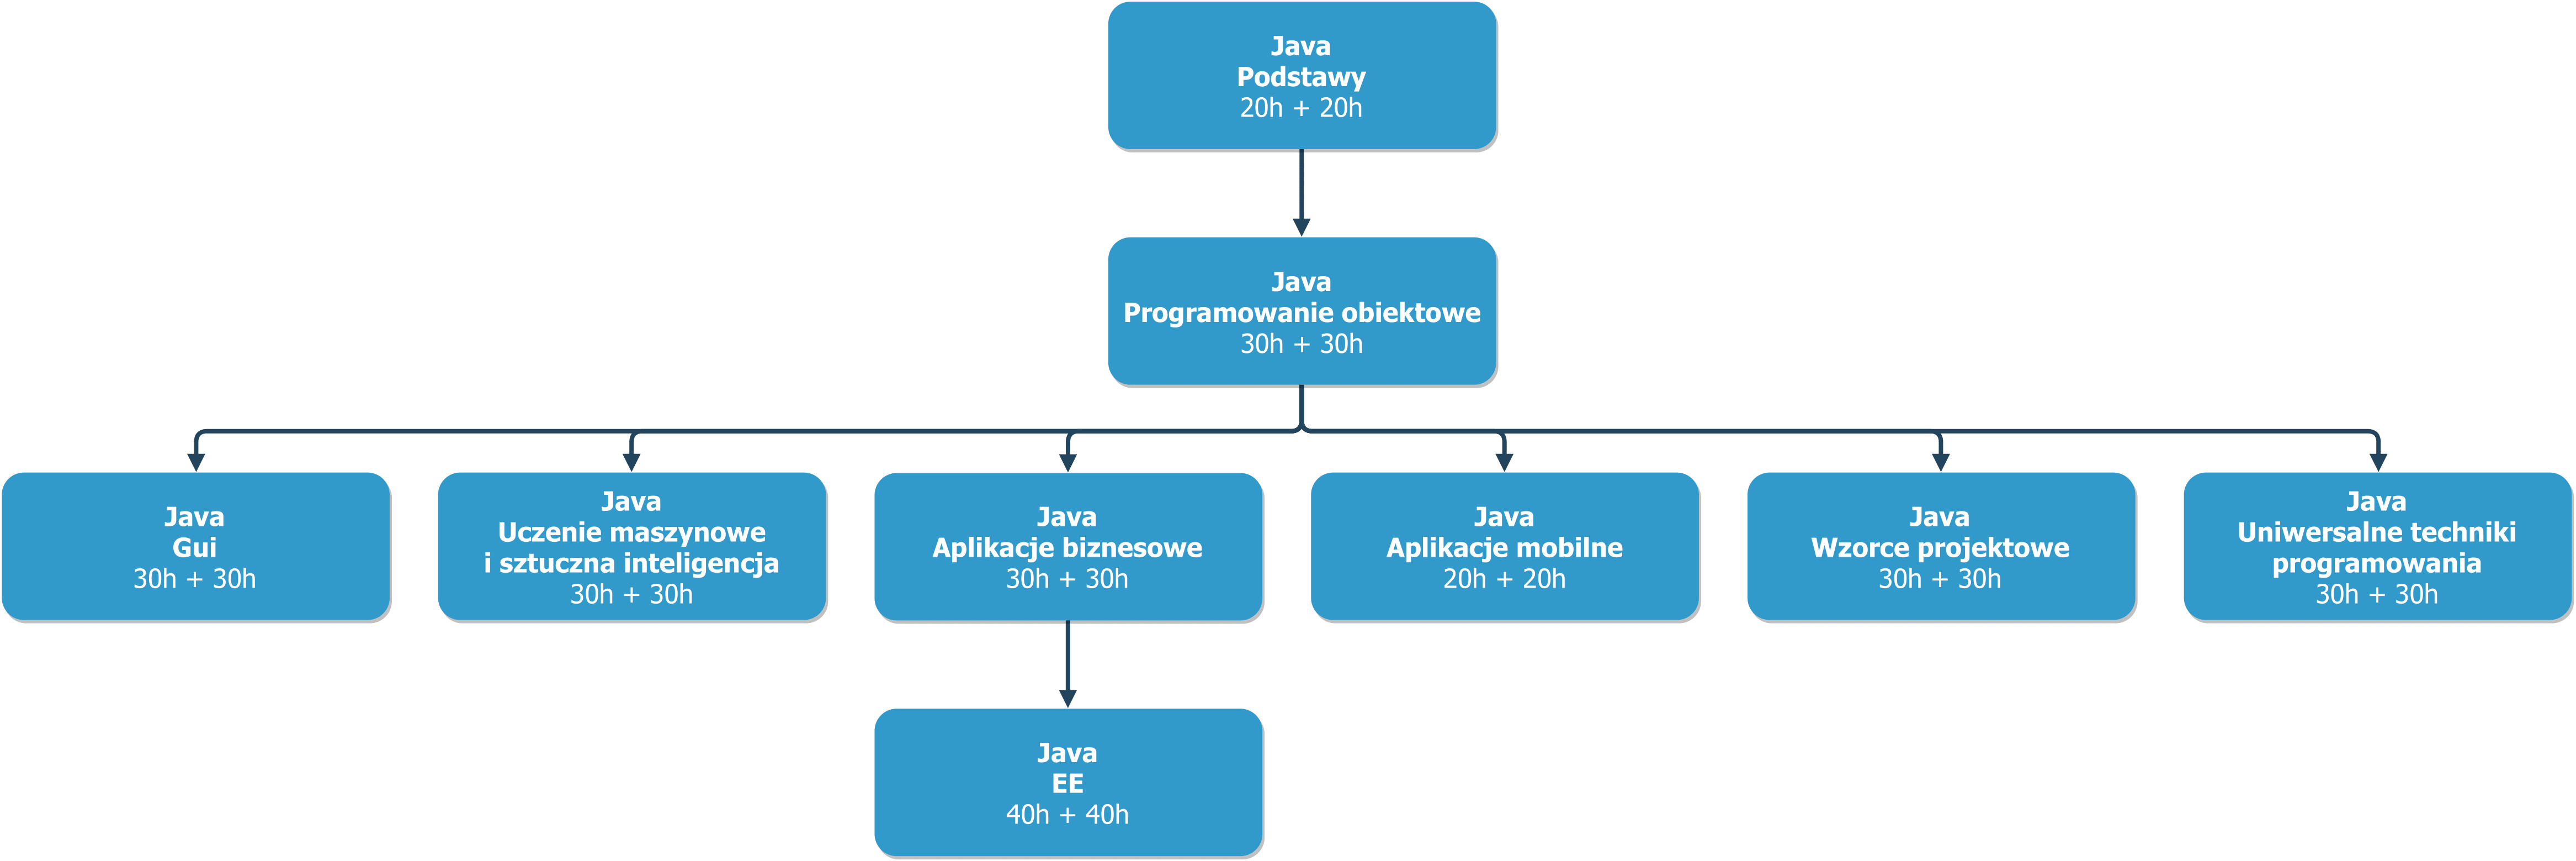 java_poziom